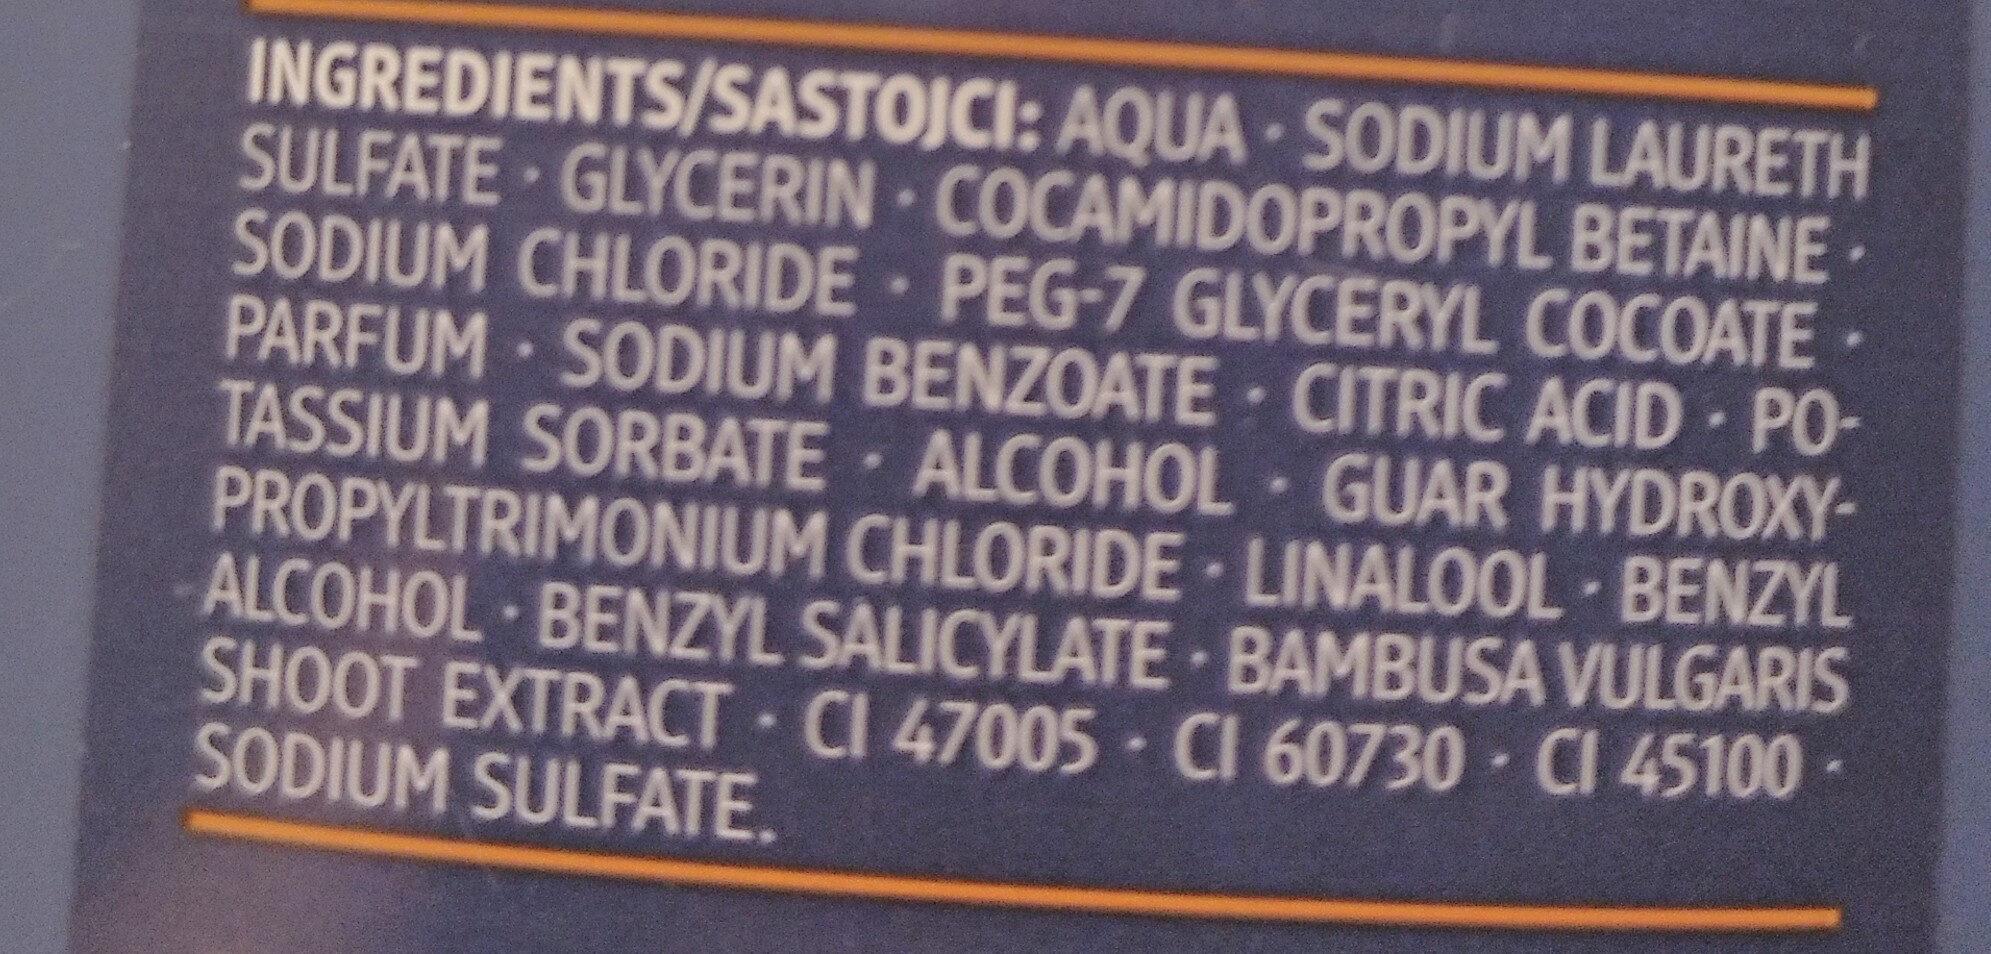 3 in 1 Durchgel - Ingredients - de